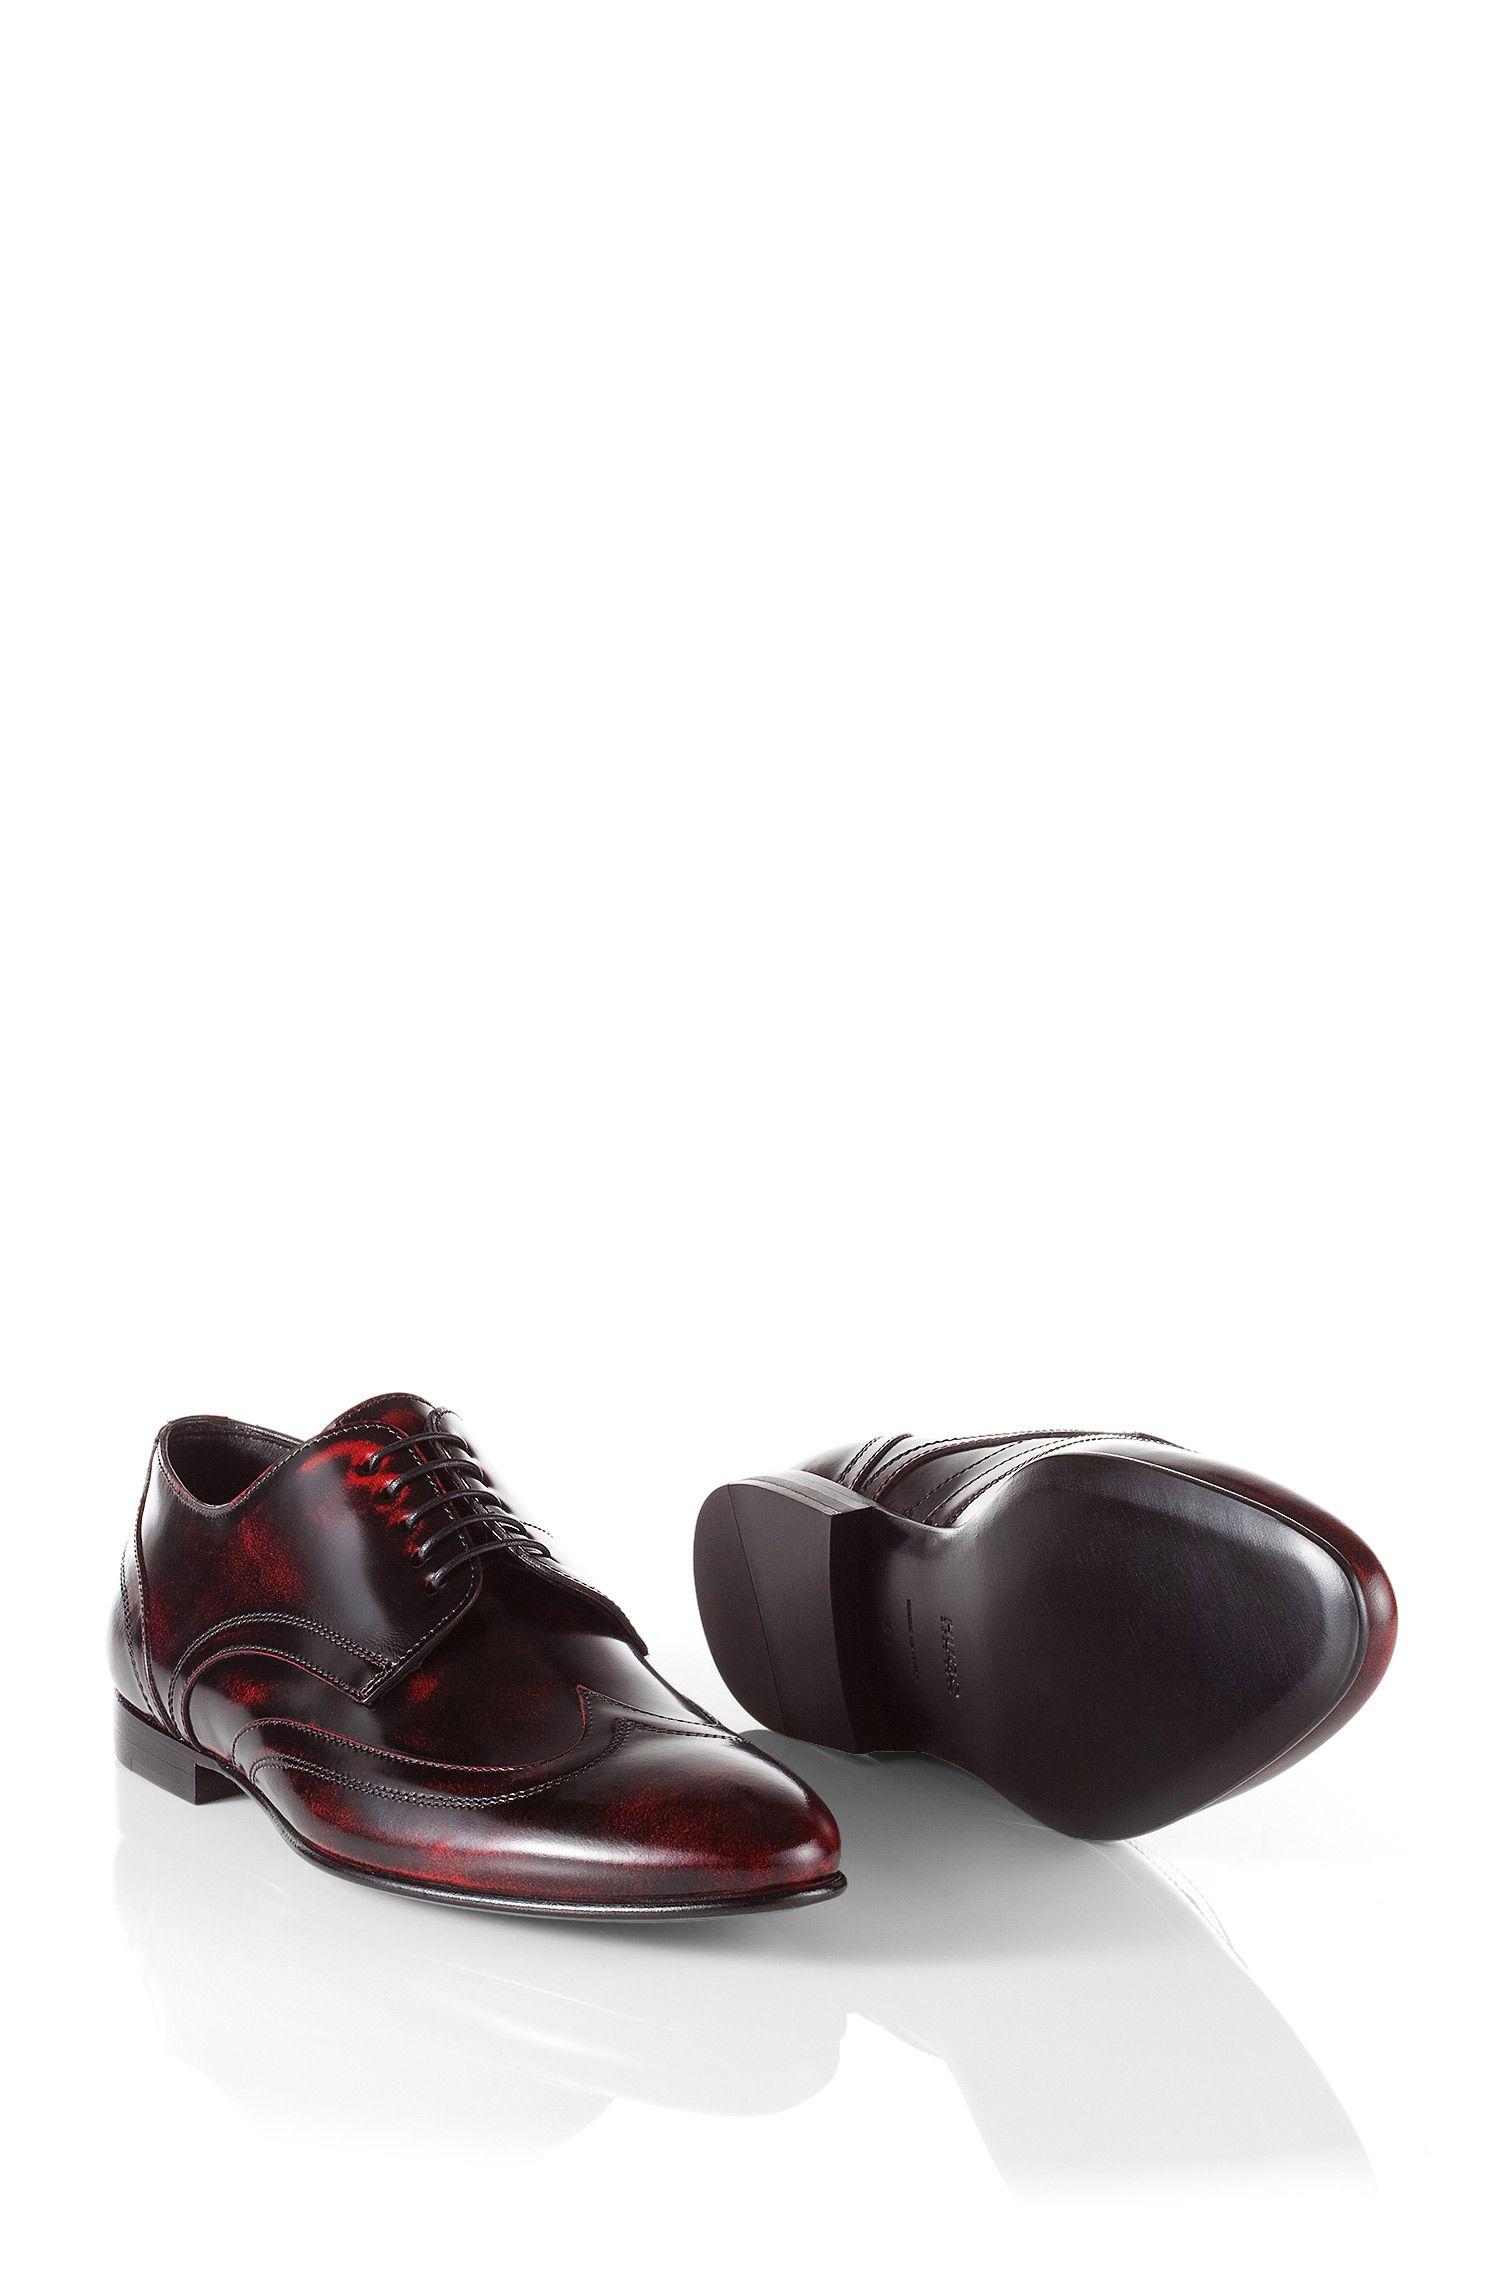 Chaussures Derby en cuir de vachette, Evvior